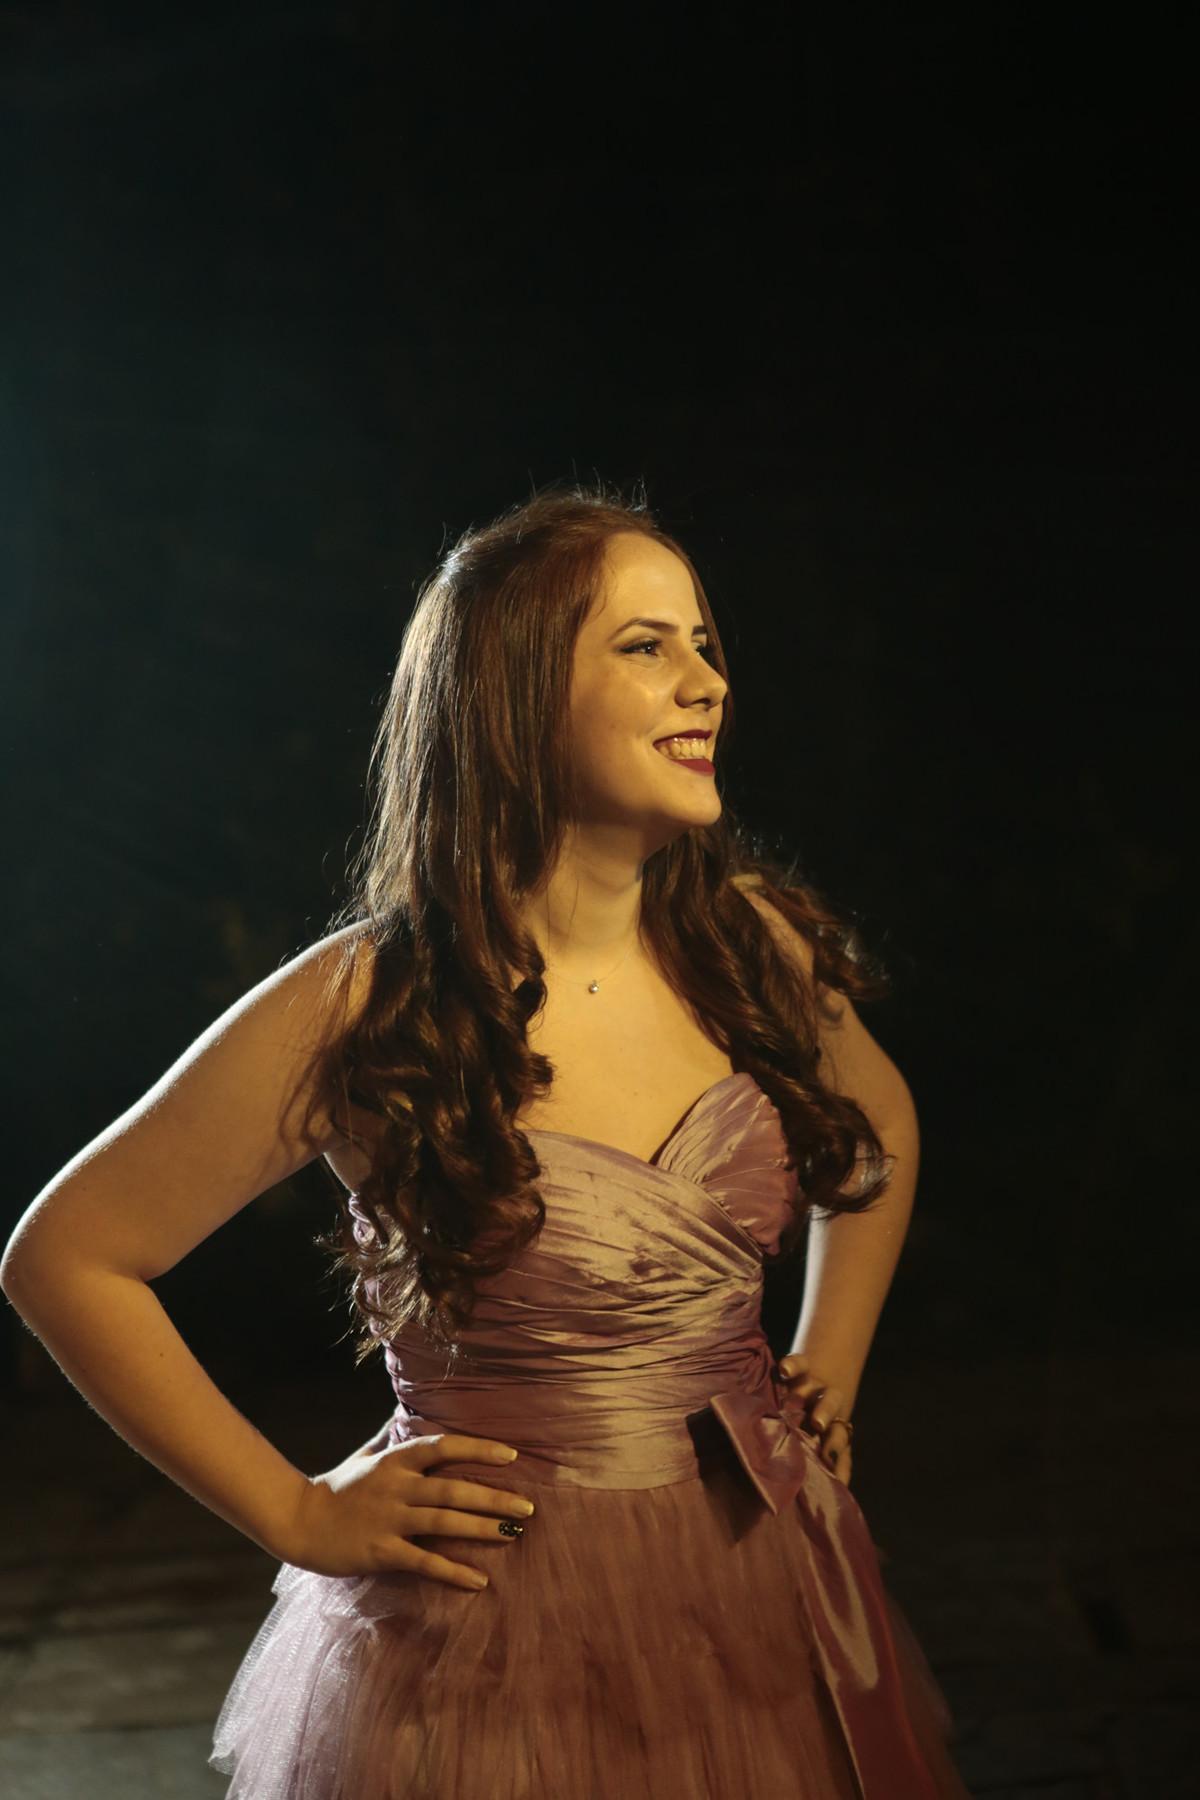 fotos 15 anos Aniversário da Fernanda D'avila no buffet grande ville